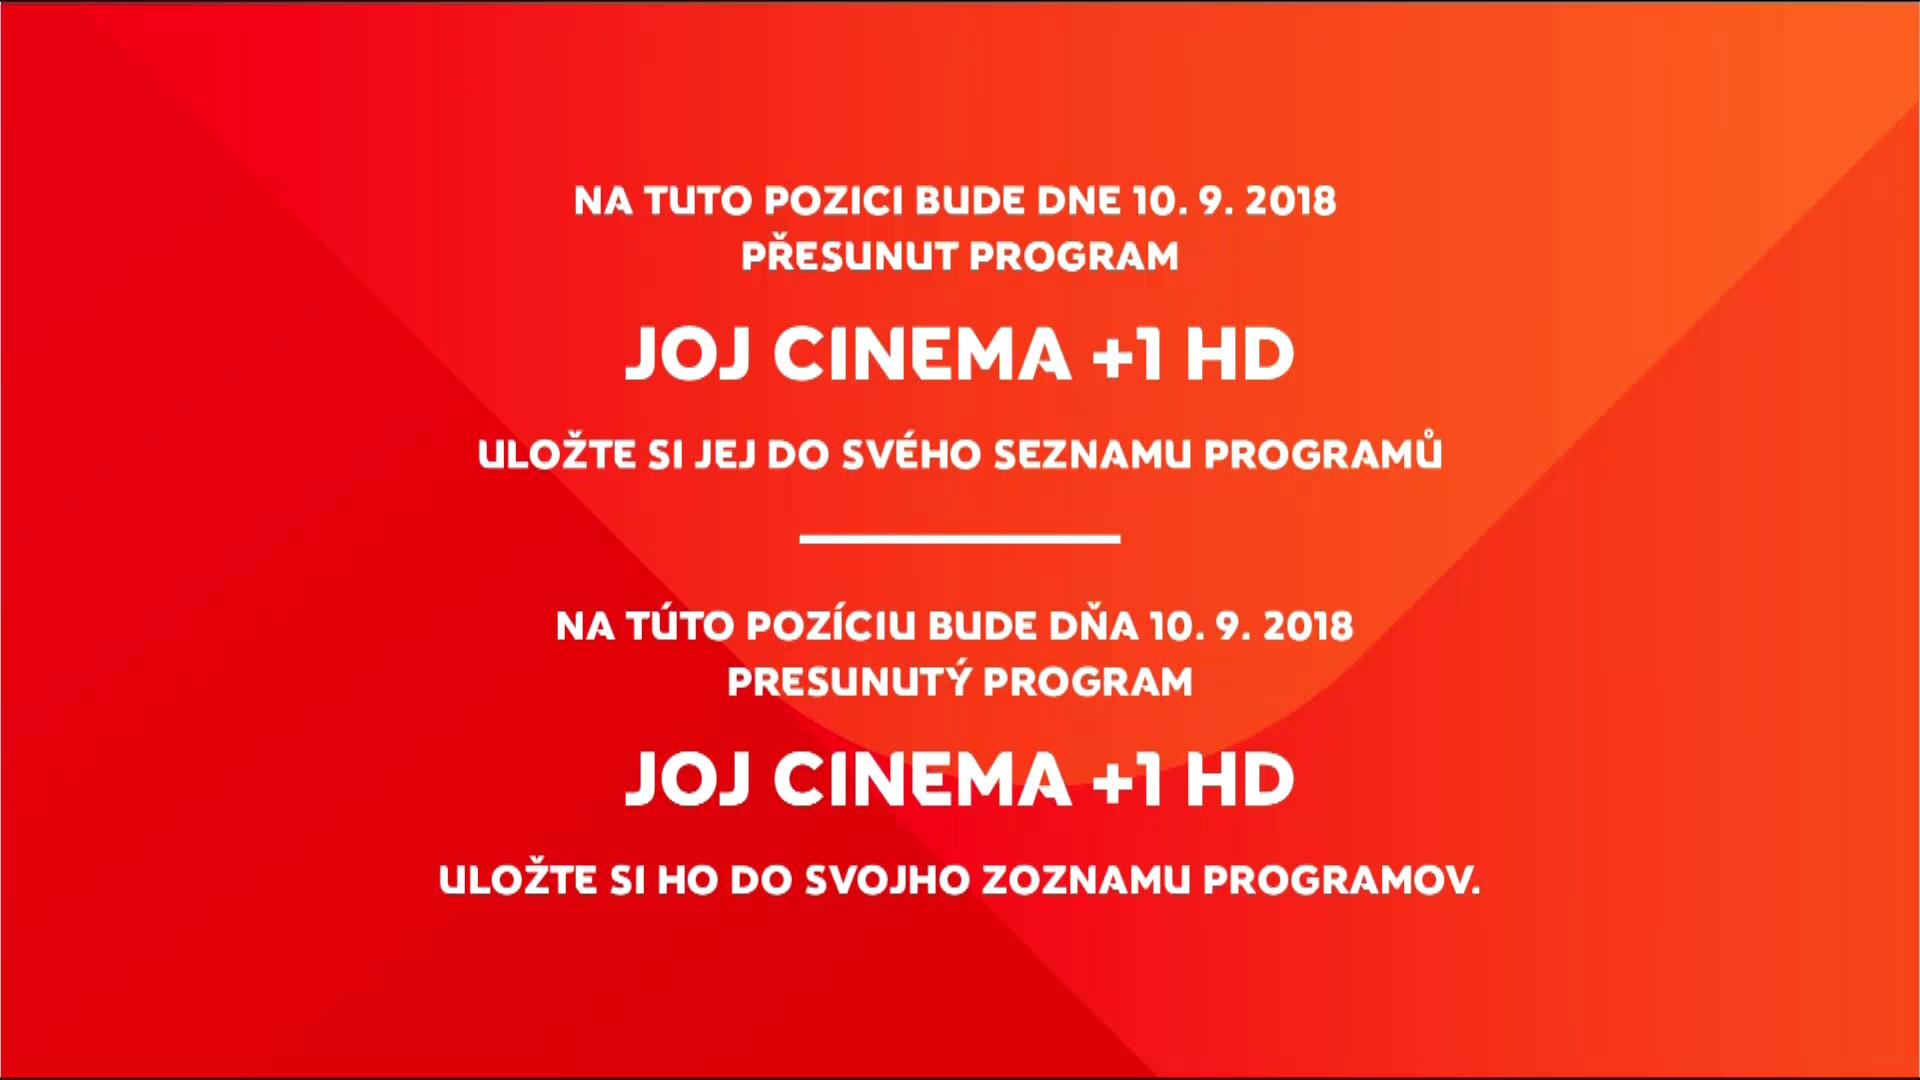 vlcsnap-2018-08-21-21h49m24s214.png